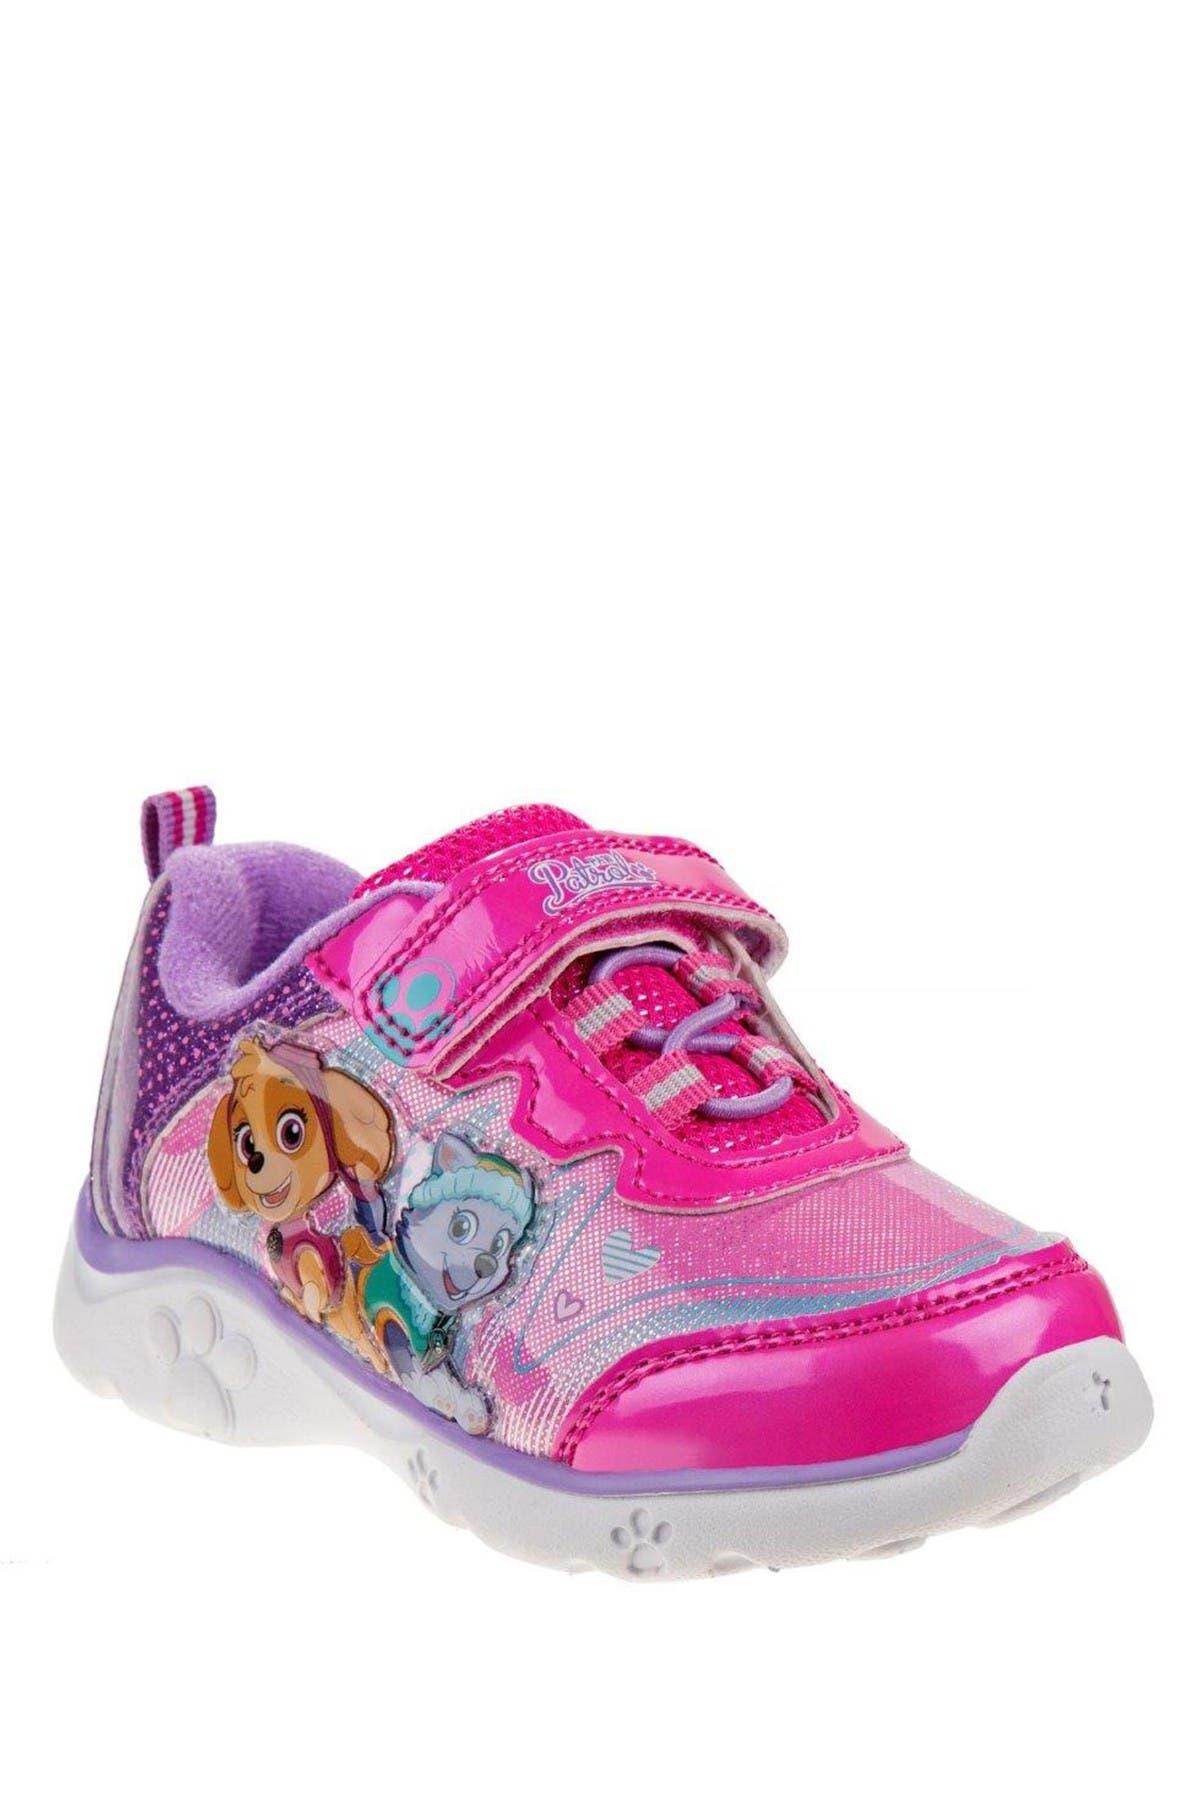 Josmo Paw Patrol Sneaker